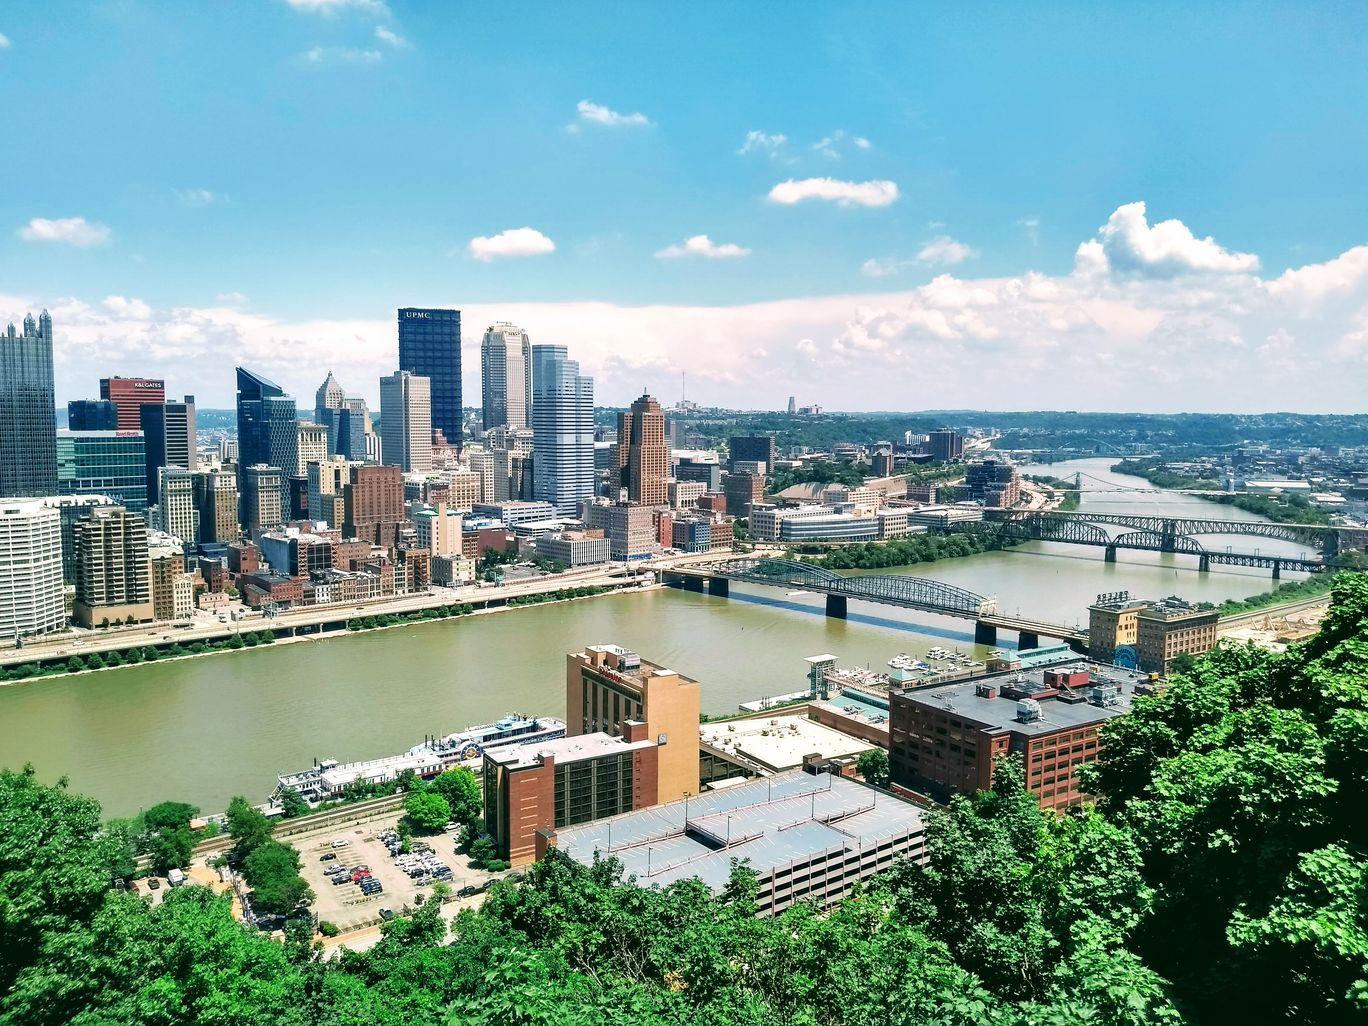 Photo of Pittsburgh By Jayashree Nagaraj